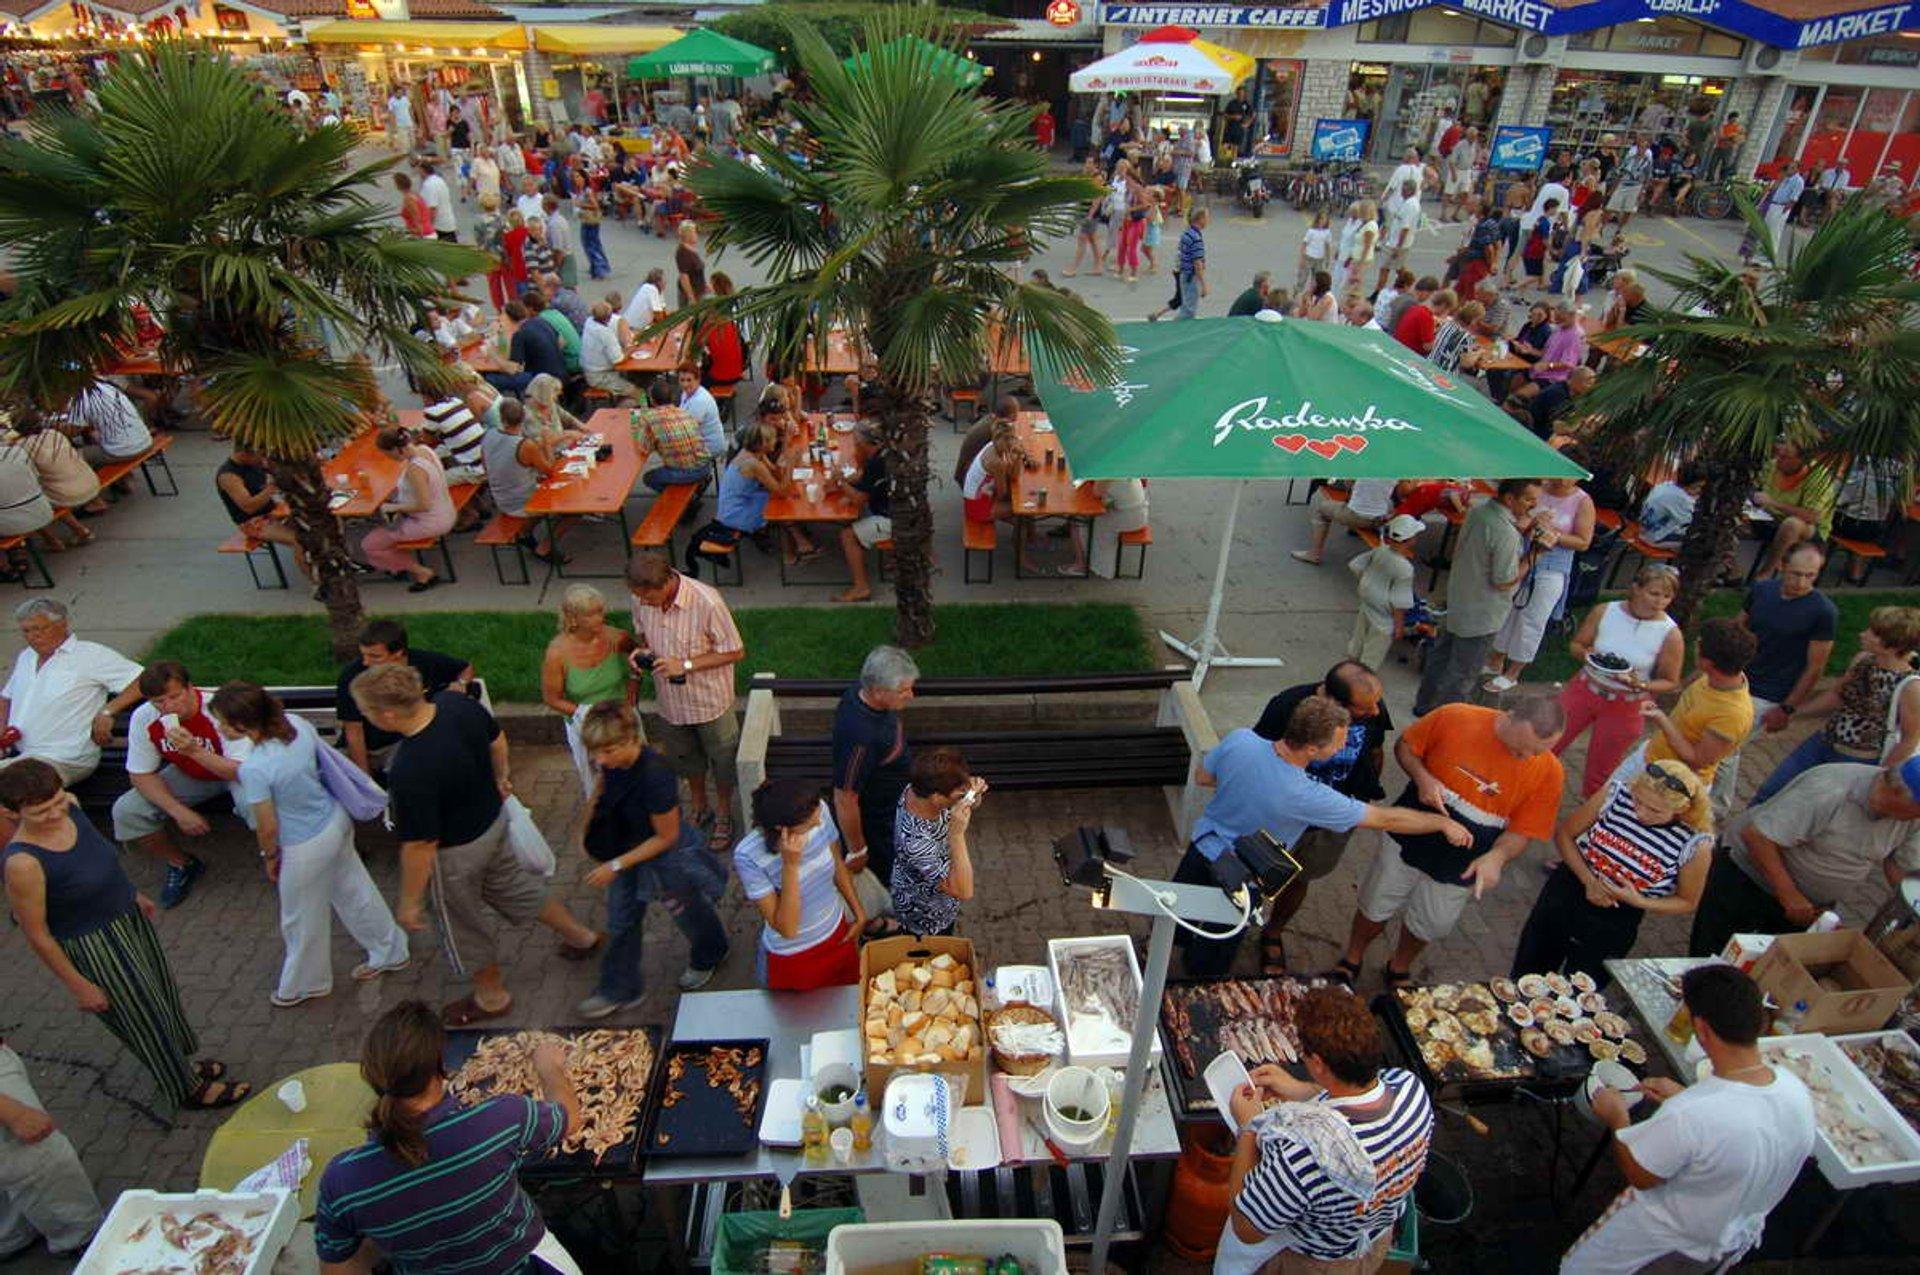 Ribarska Festa in Croatia - Best Season 2020